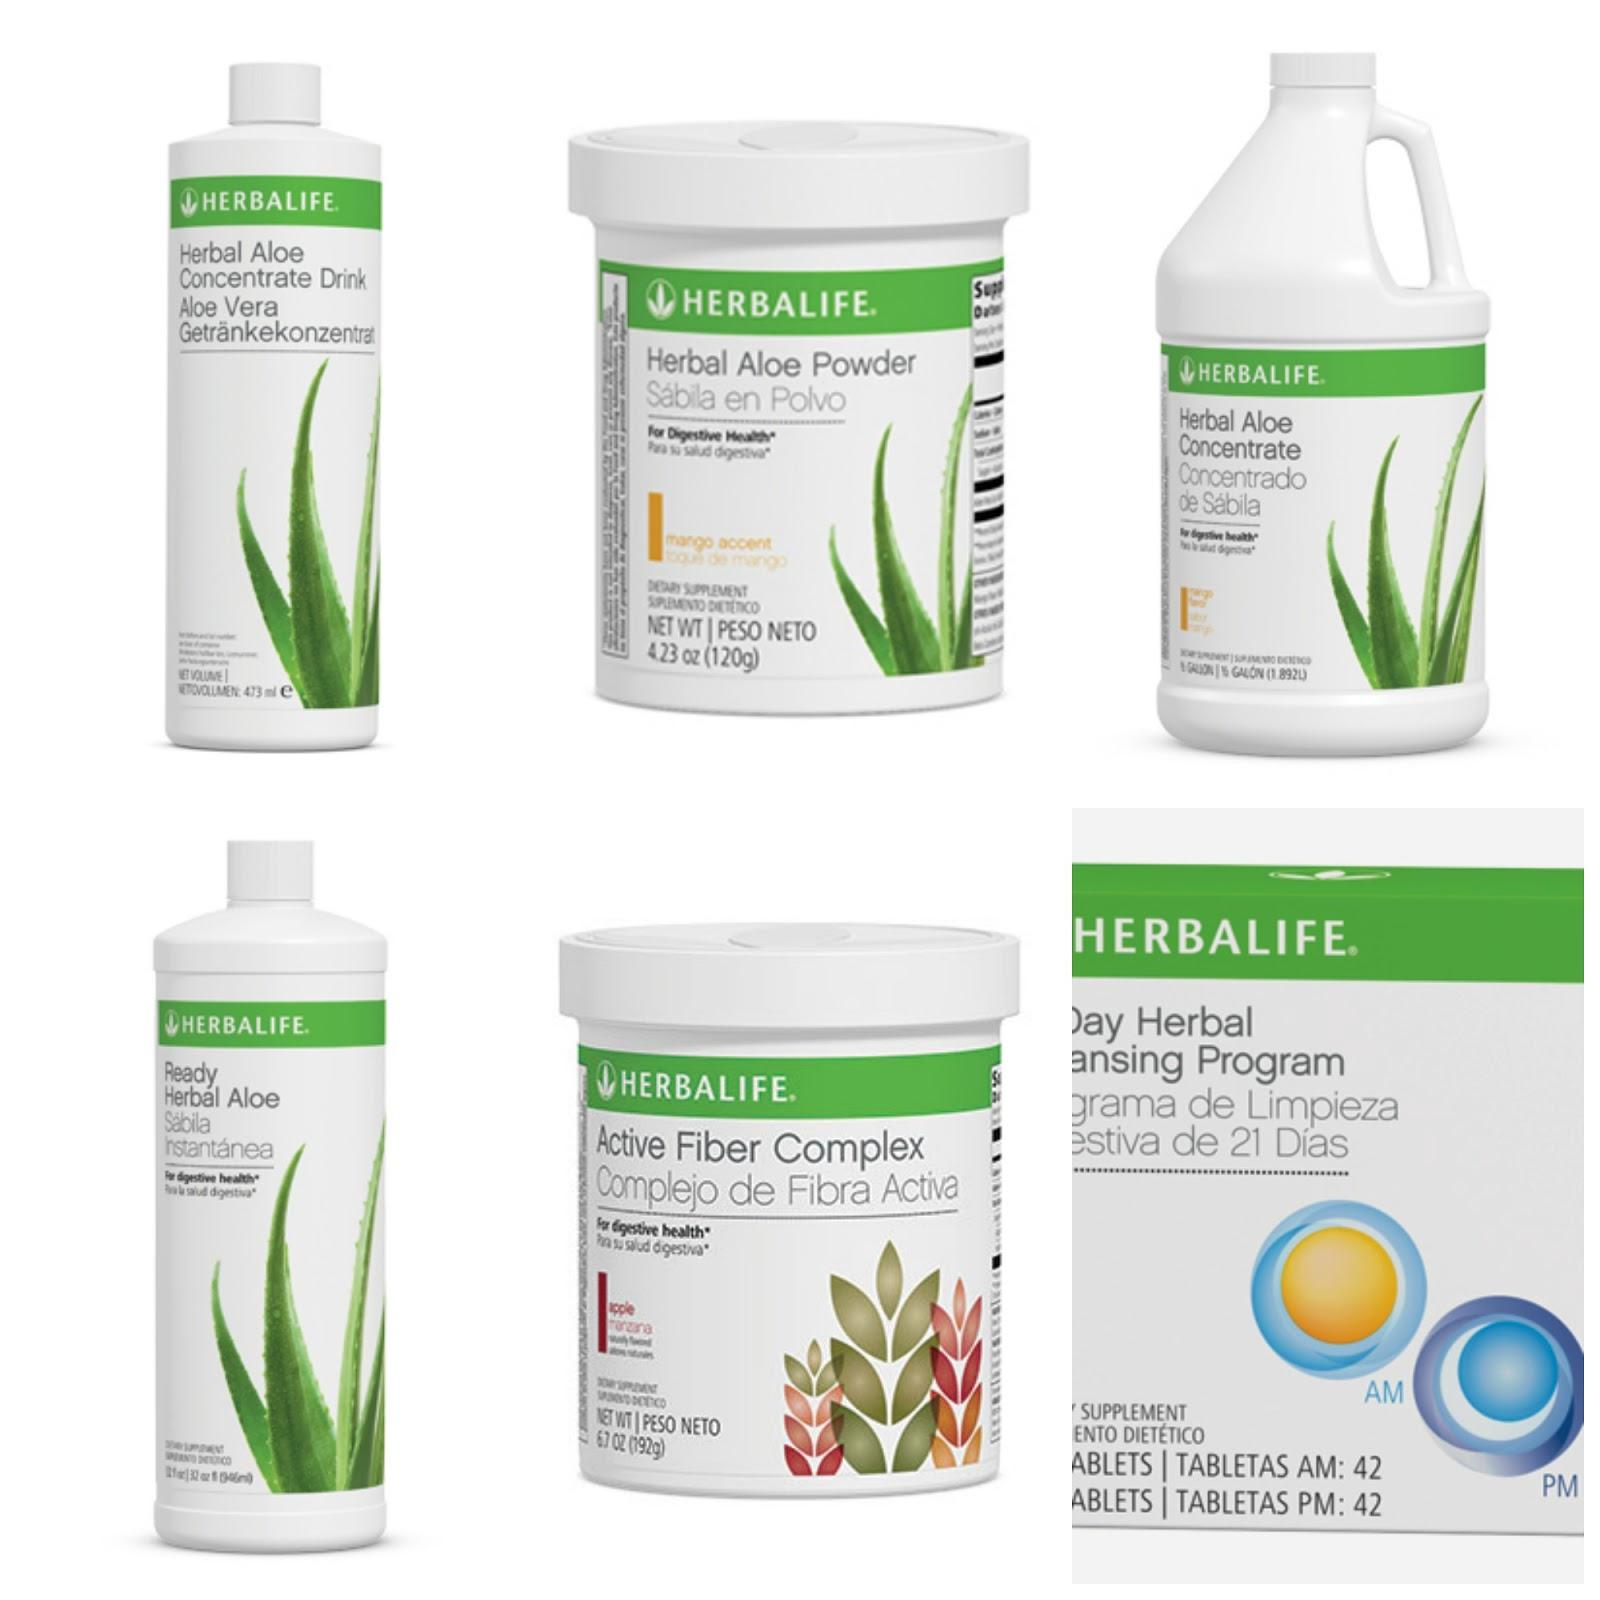 Herbalife Independent Distributor: Digestive Health